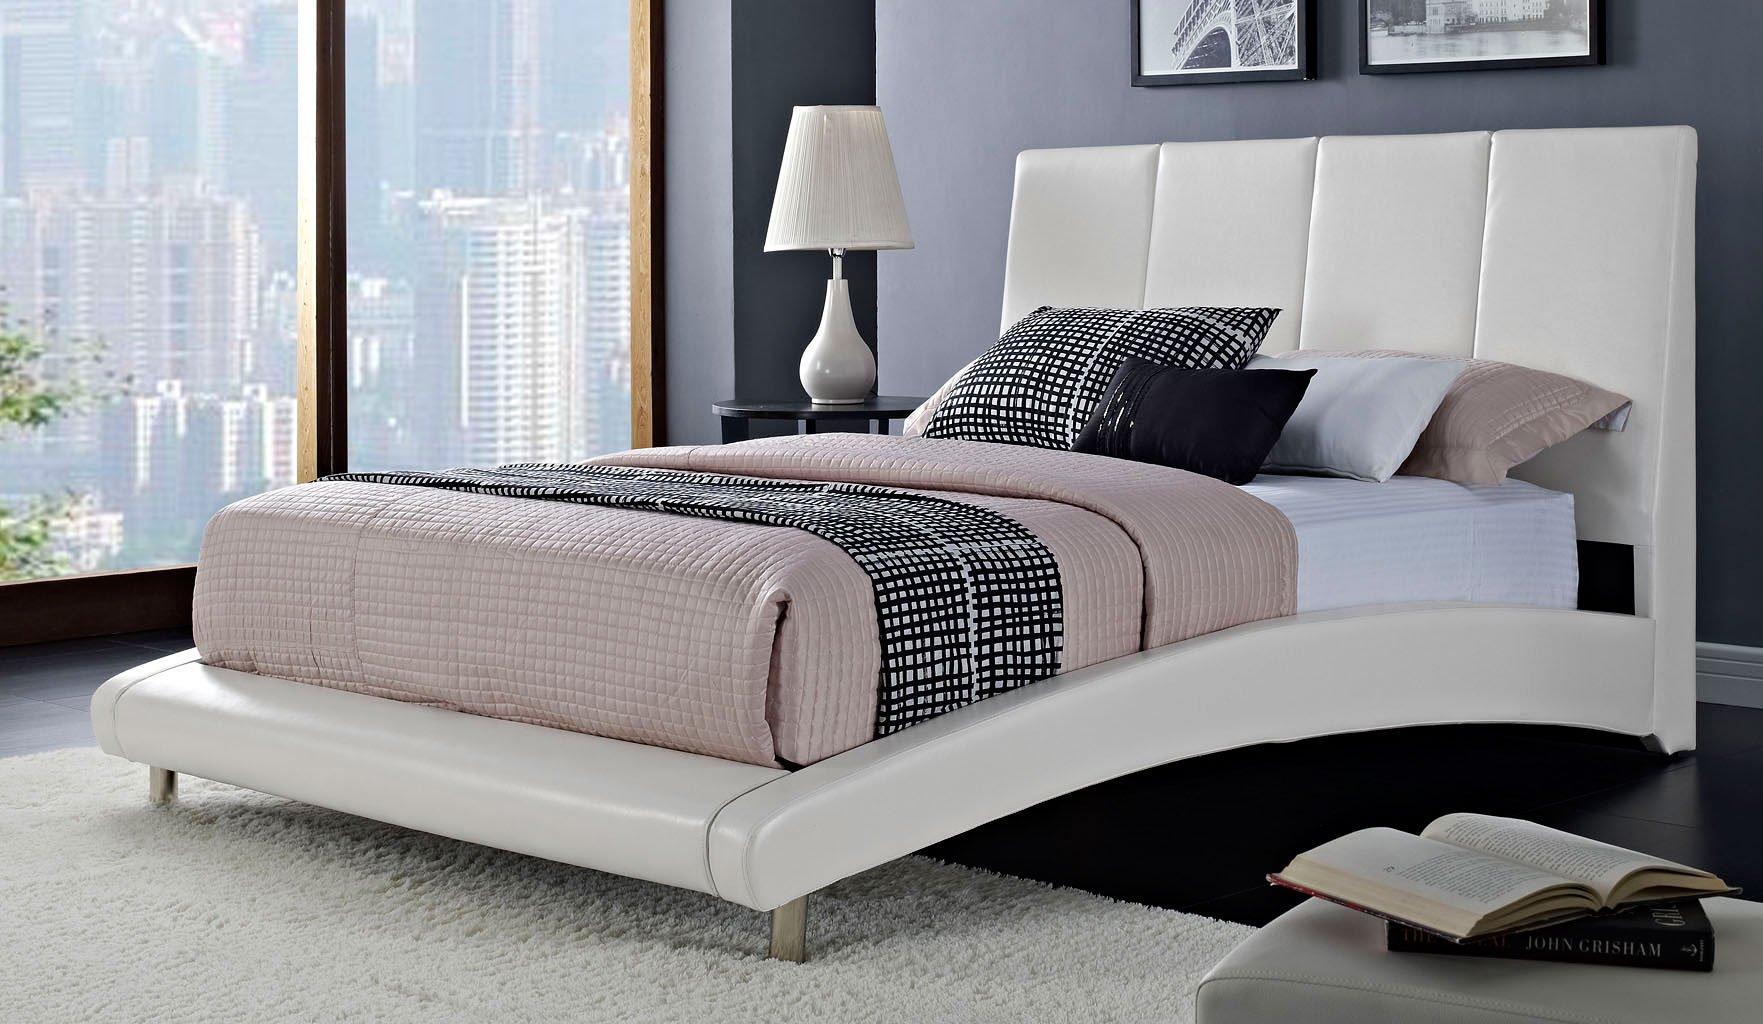 moderno upholstered bed white standard furniture